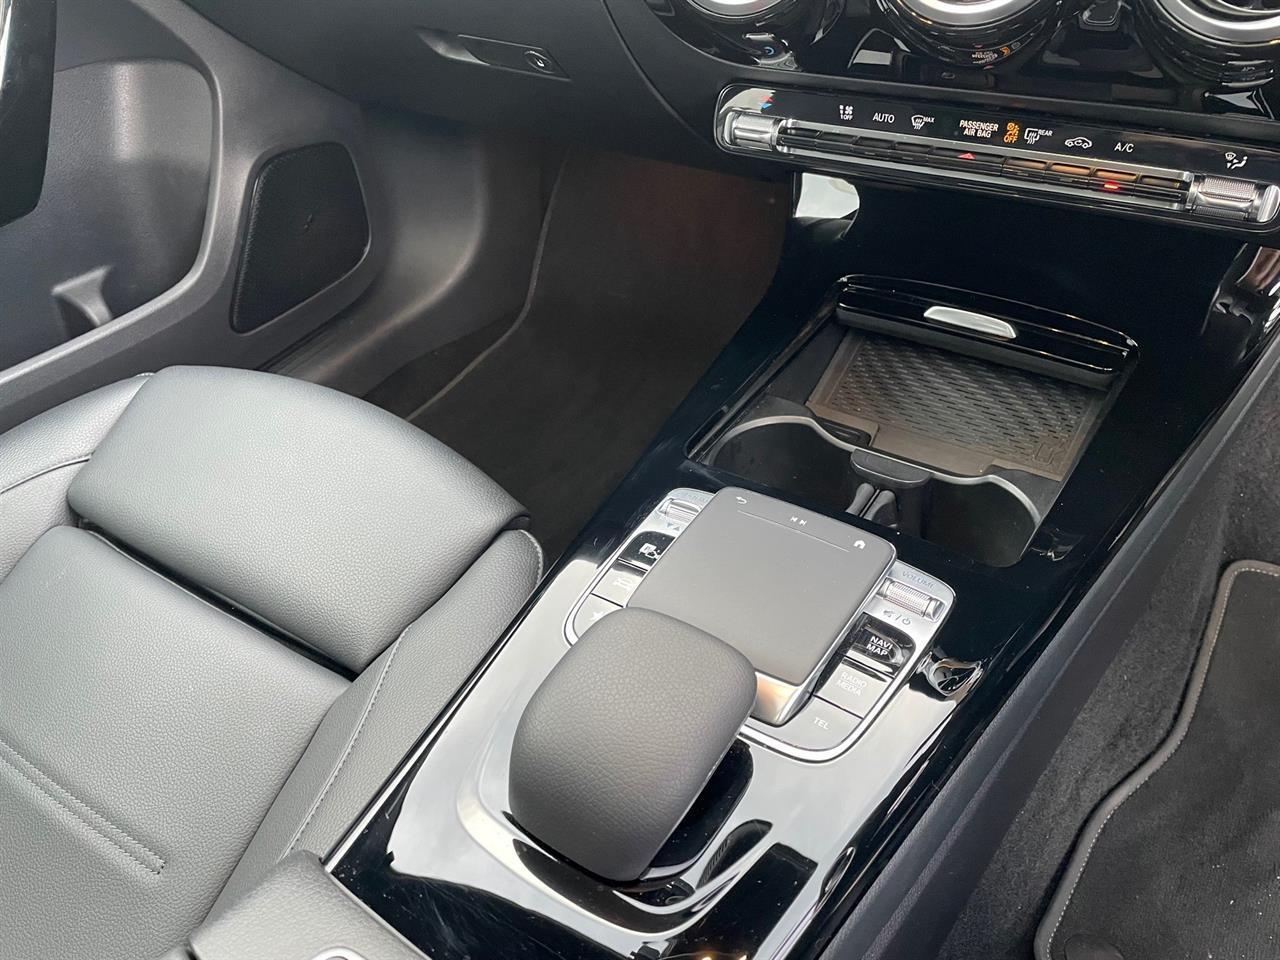 image-12, 2019 MercedesBenz A180 1.3T 7 Speed New Model at Christchurch